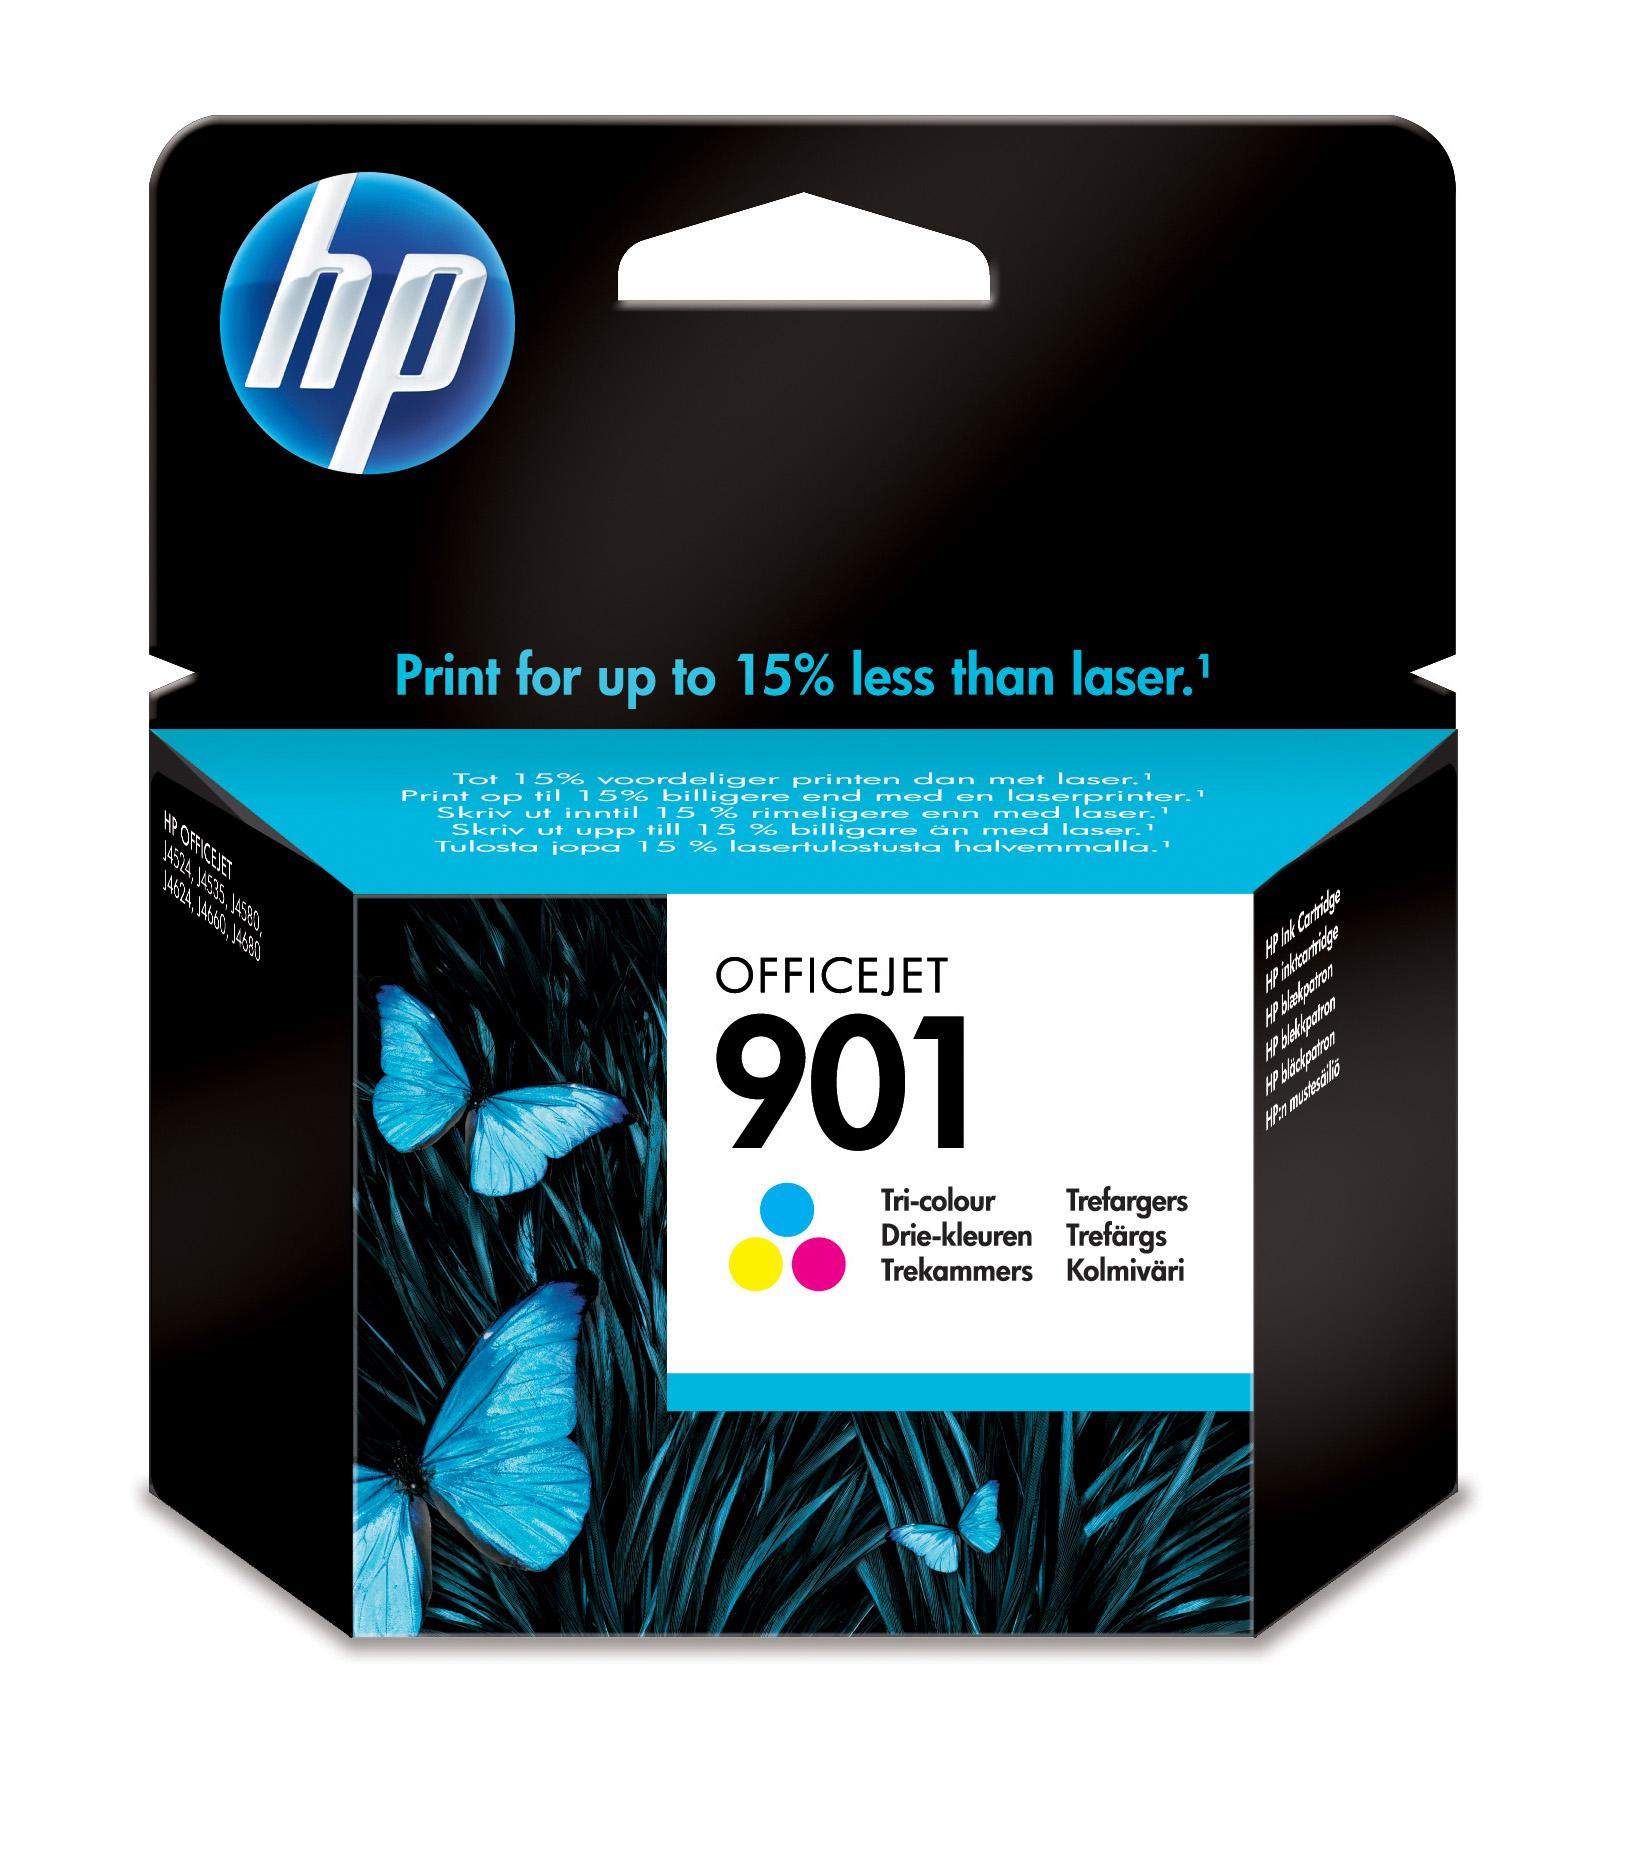 HP 901 Tri-color Officejet Ink Cartridge Original Cian, Magenta, Amarillo 1 pieza(s)